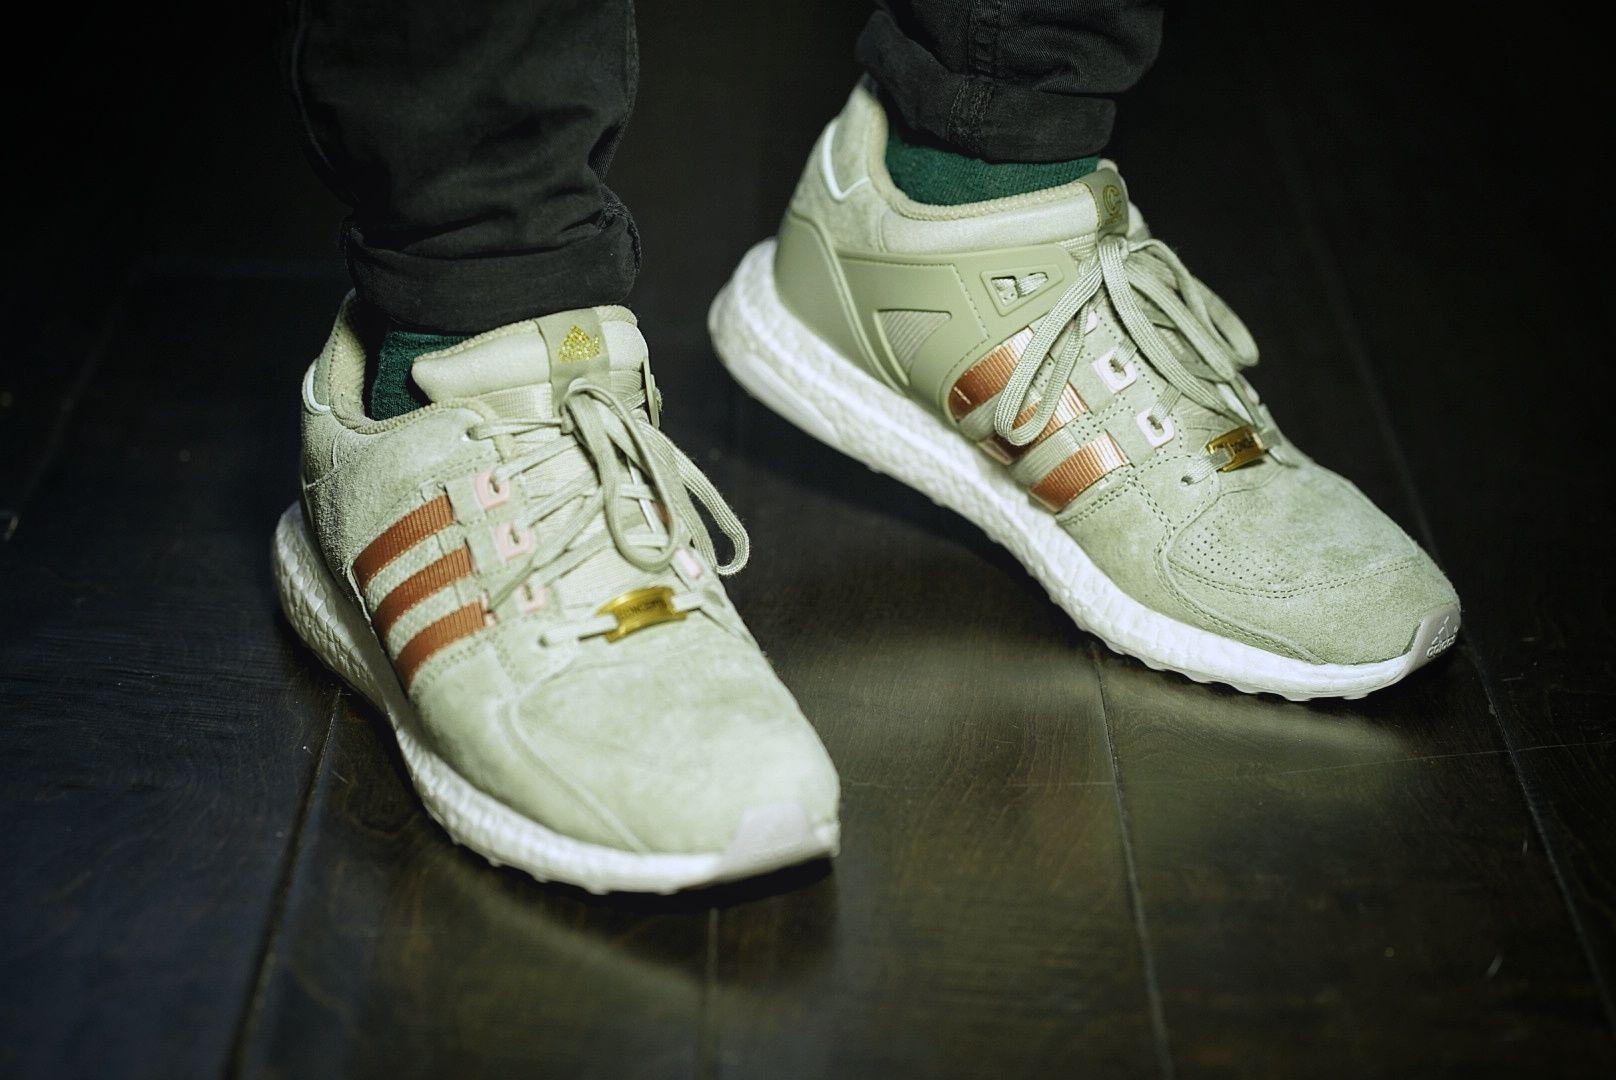 Adidas Eqt Boost Sage